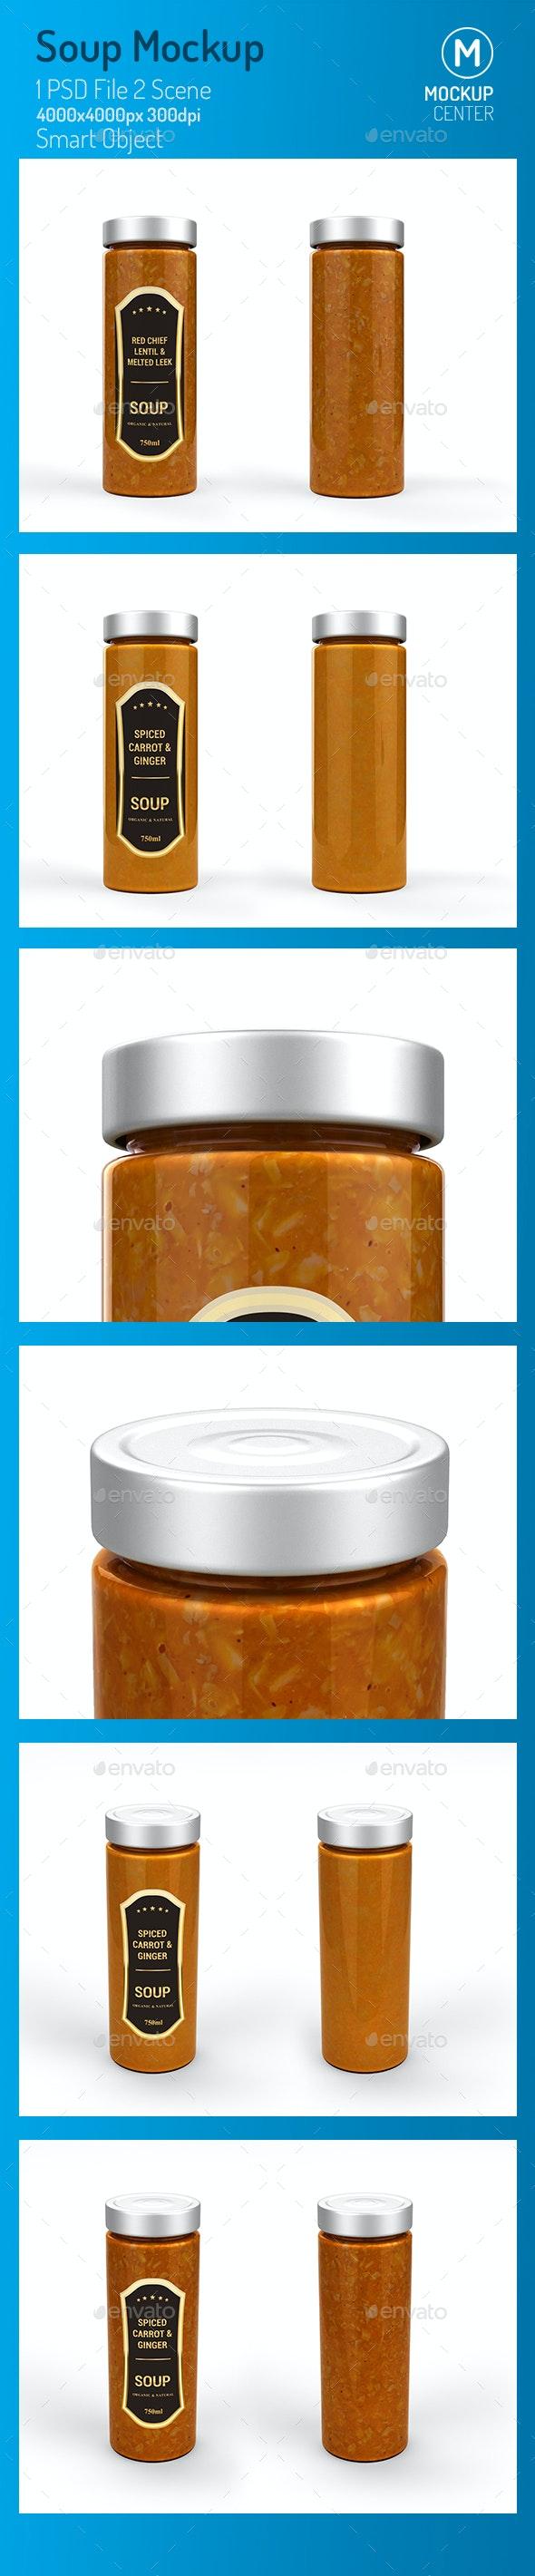 Soup Jar Mockup - Product Mock-Ups Graphics